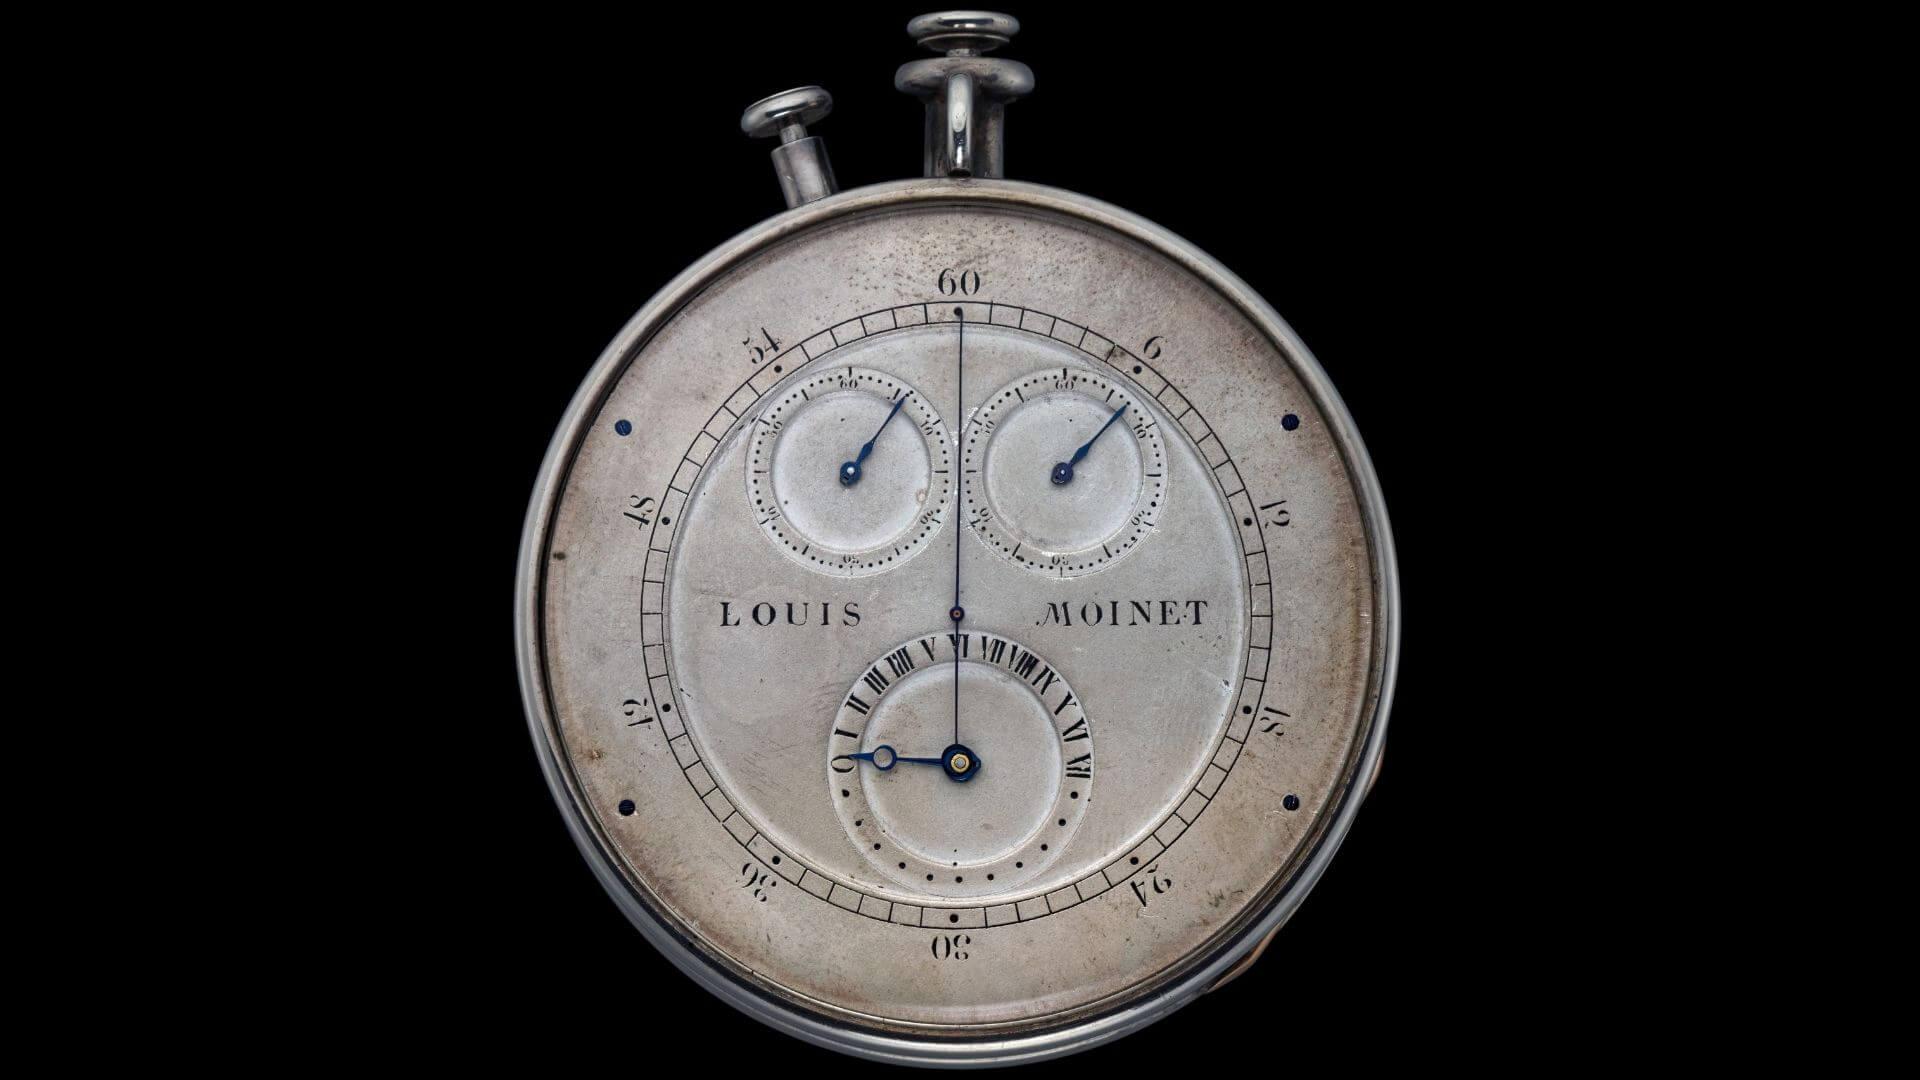 30 Hz: Louis Moinet Chronograph